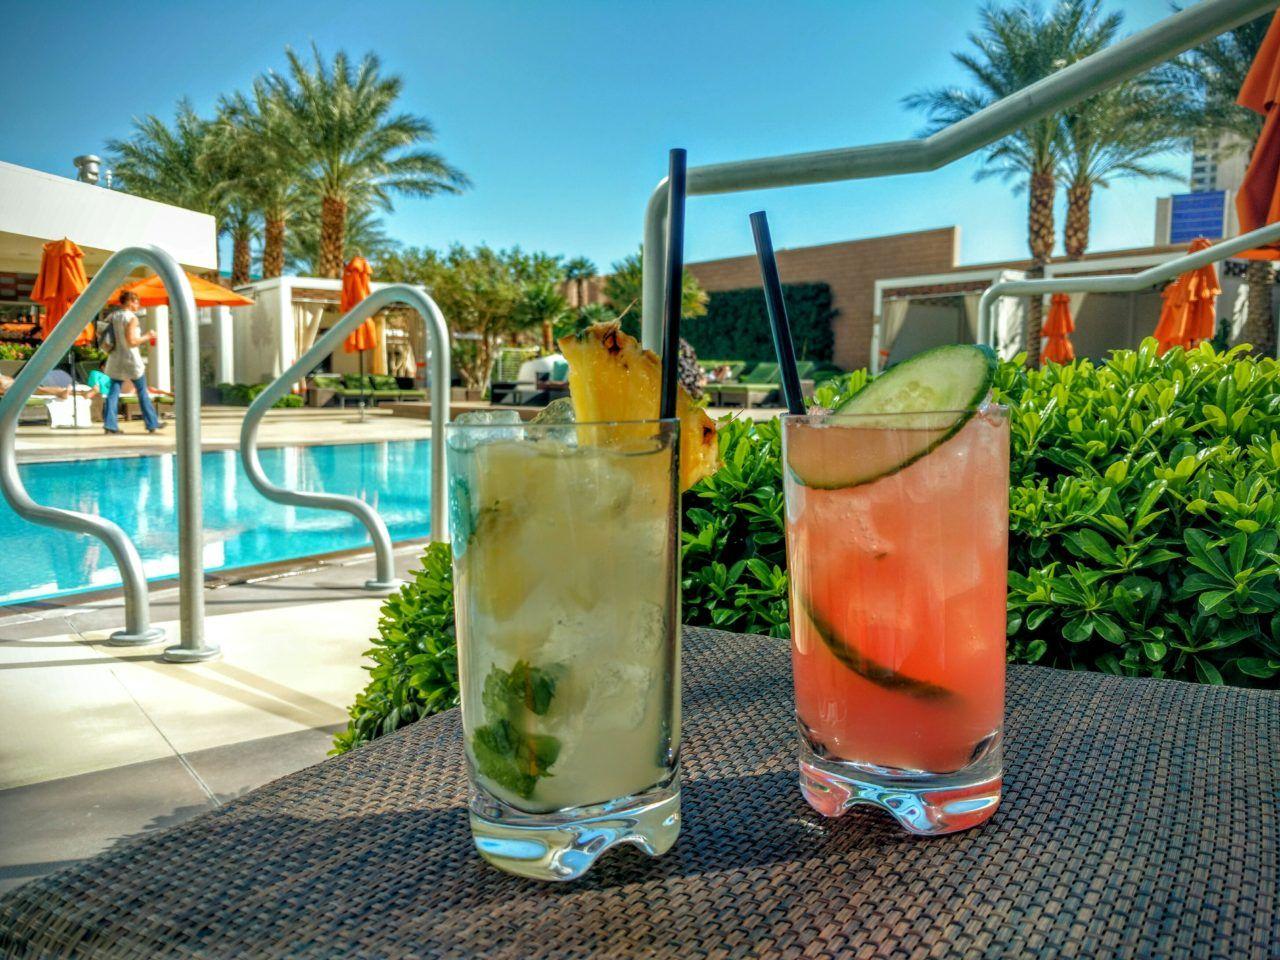 Las Vegas Guide for Grown-Ups | Places to Visit | Pinterest ...